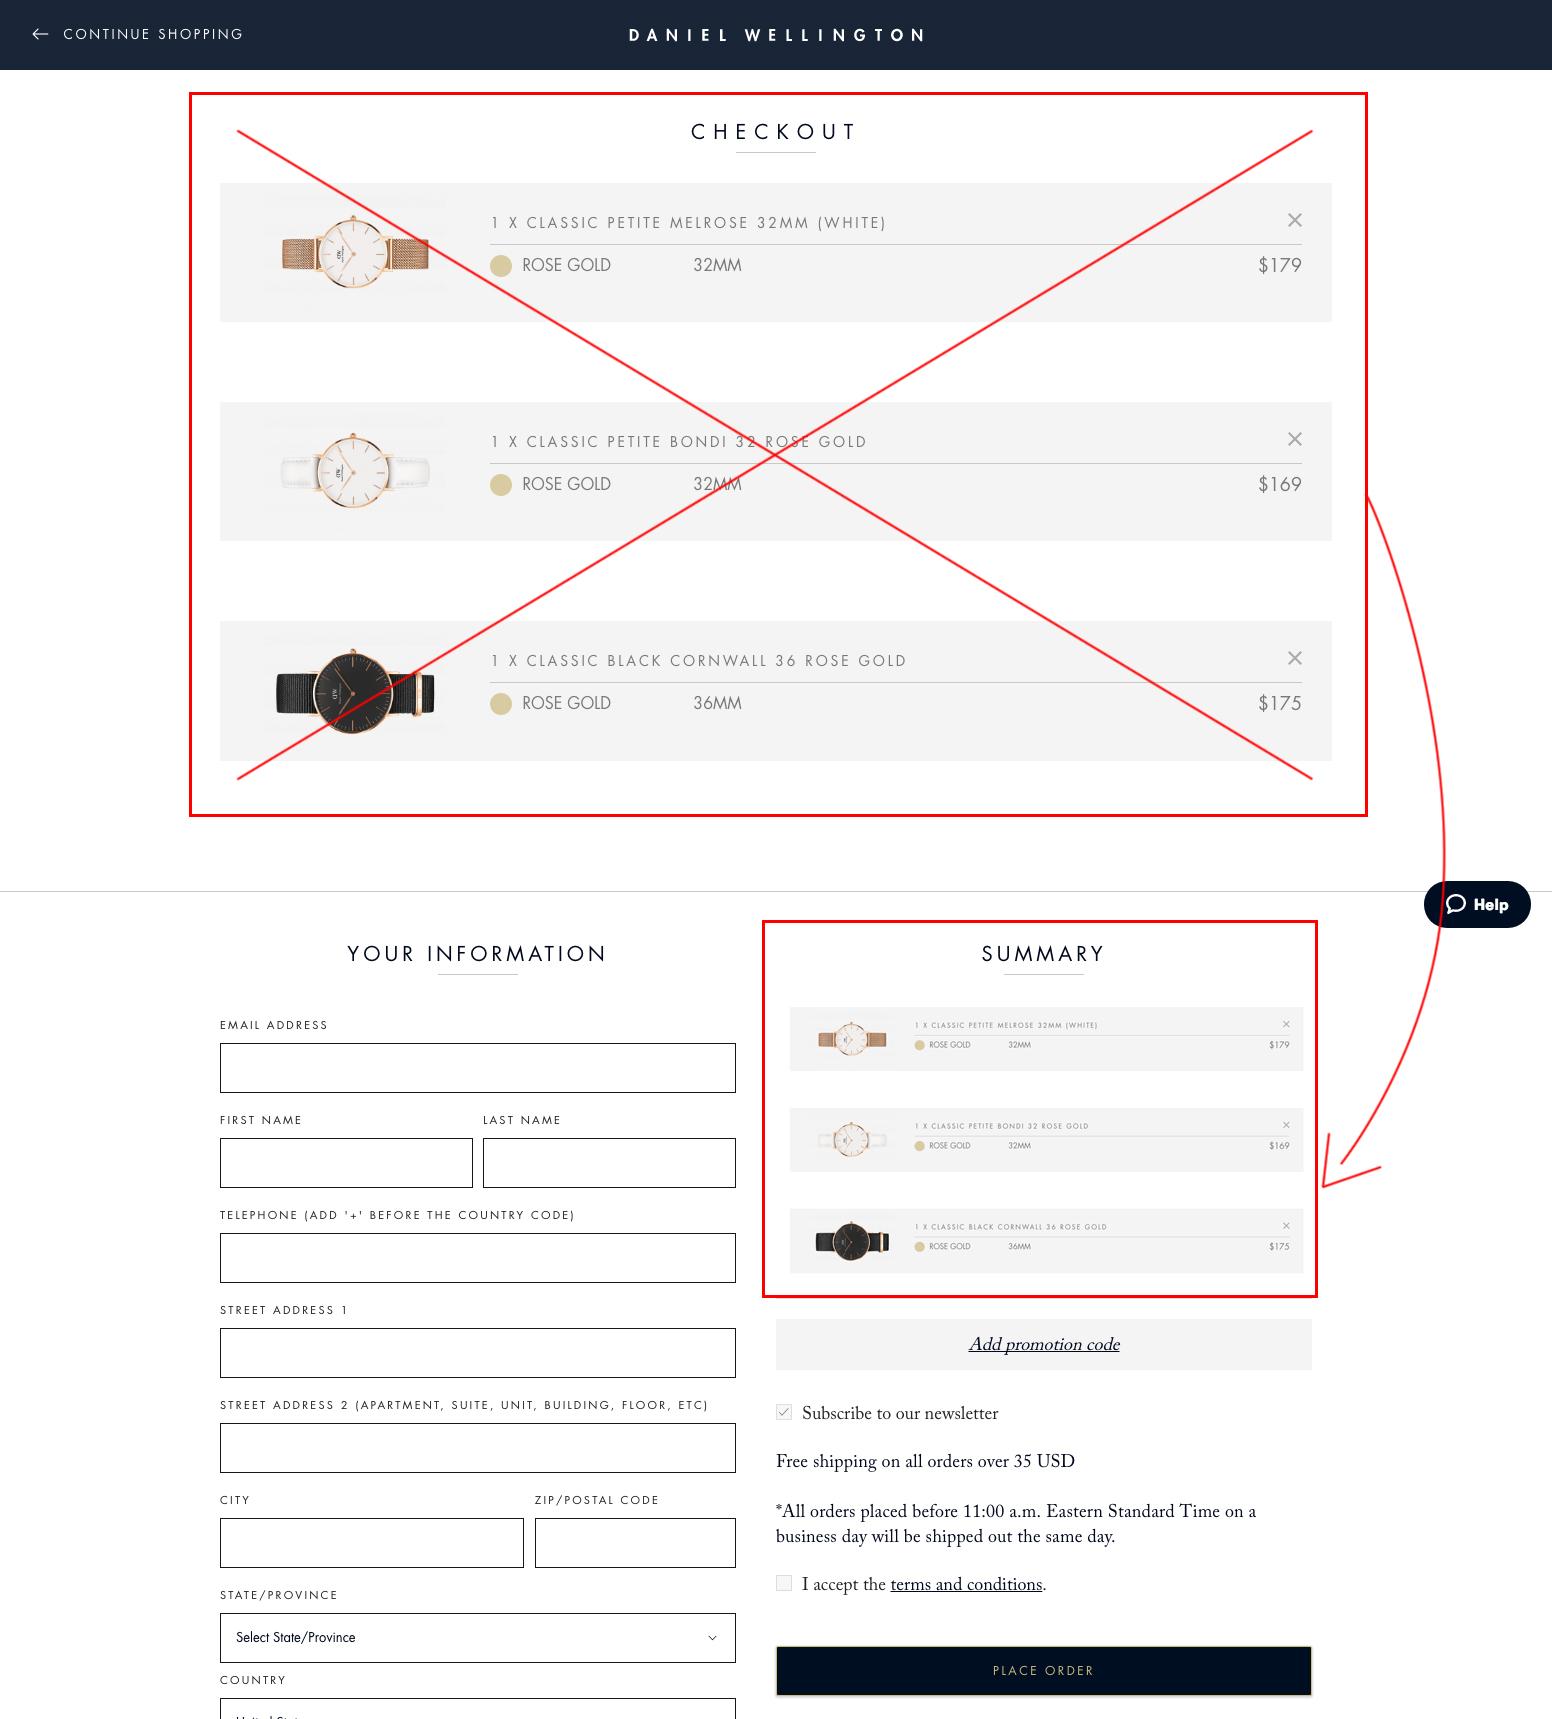 New Checkout Page Mockup